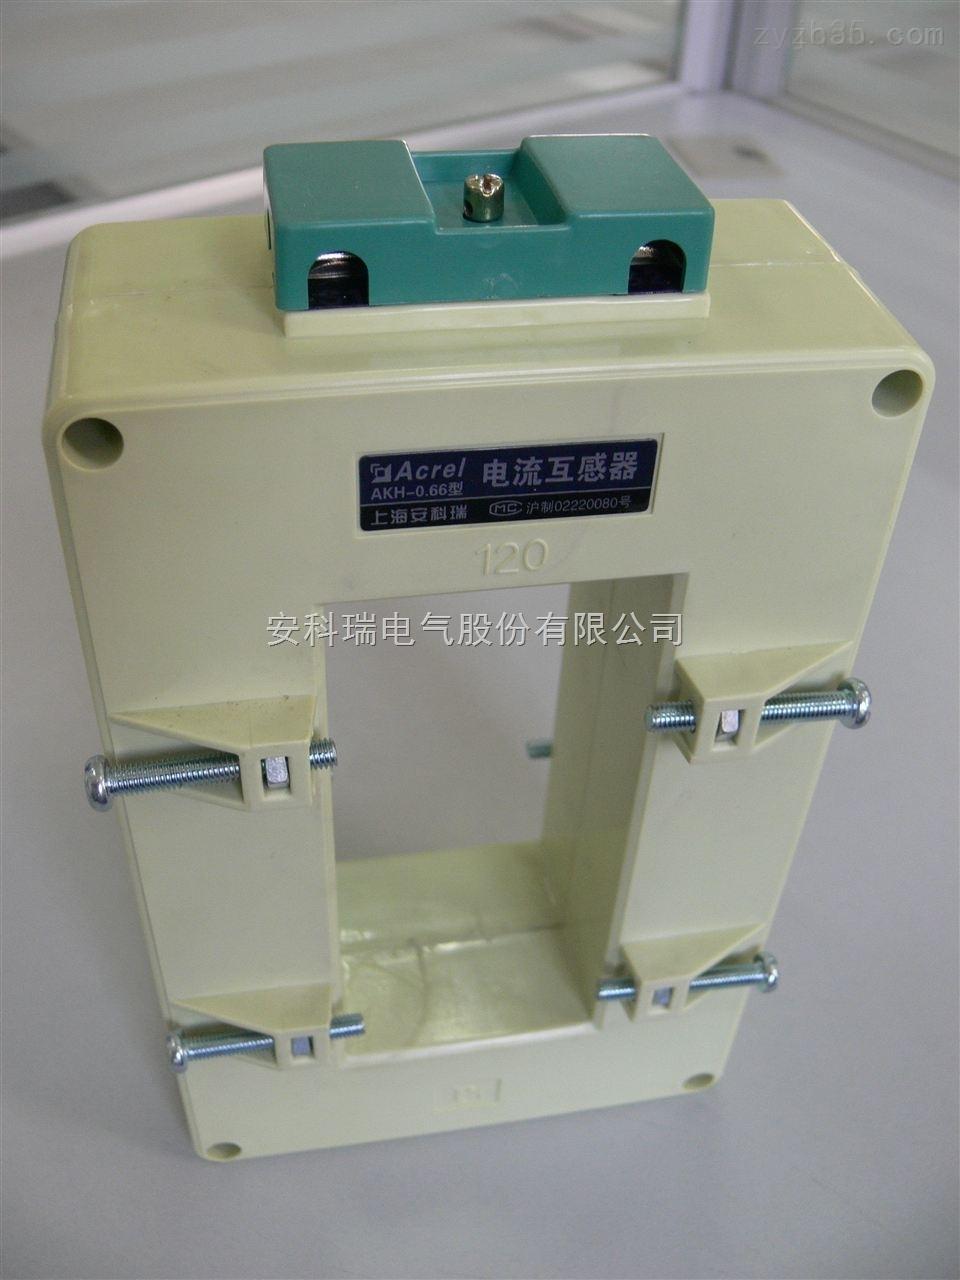 安科瑞AKH-0.66/III 120III 4000/5 电流互感器